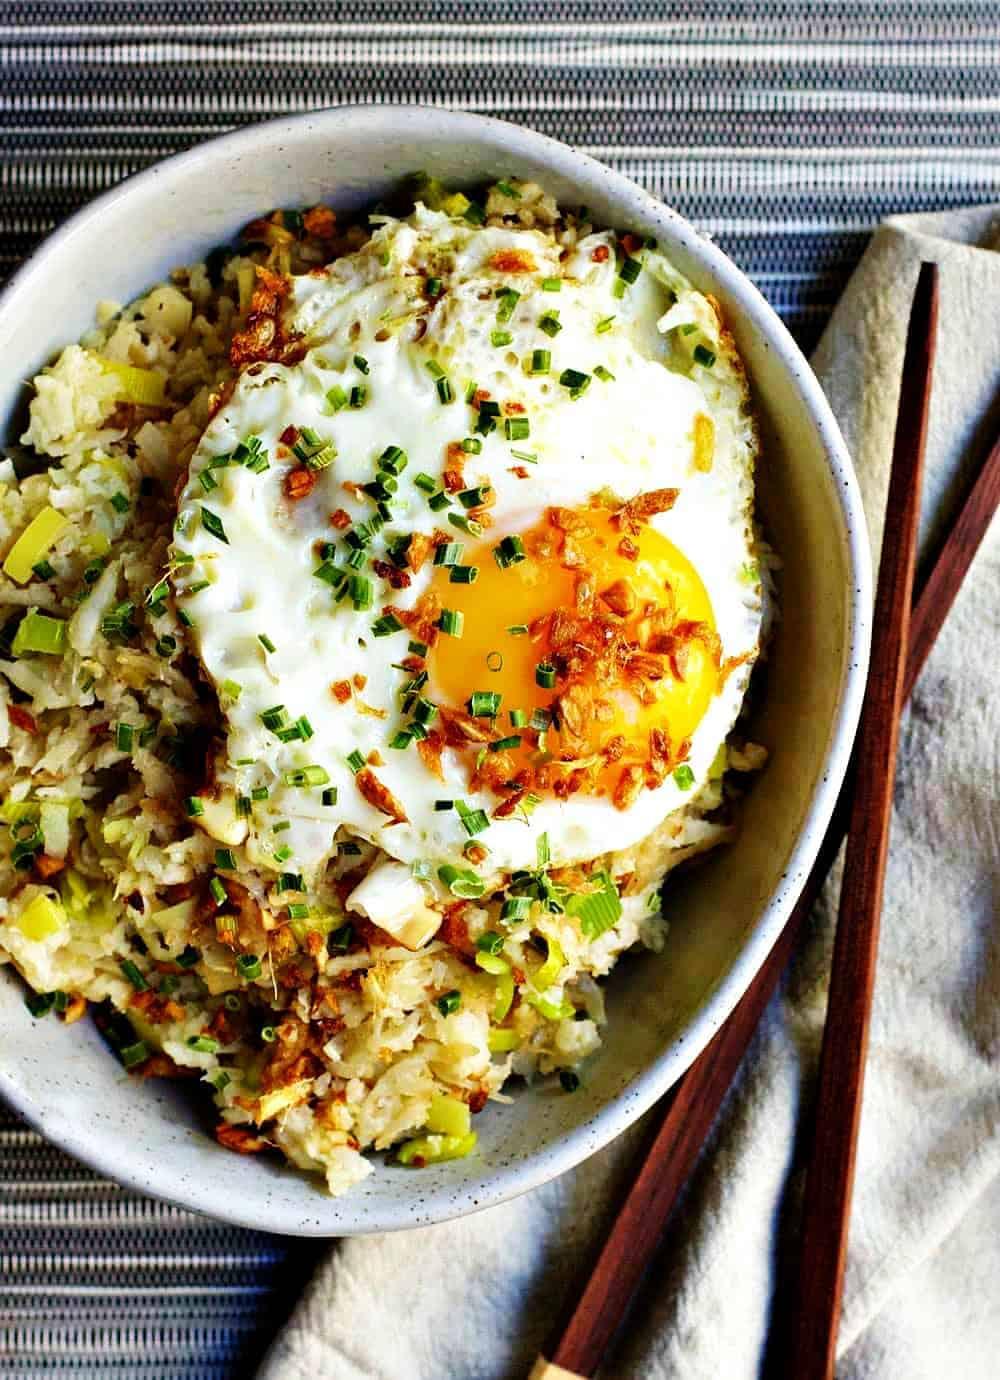 Cauliflower Fried Rice served with Chopsticks and Napkin